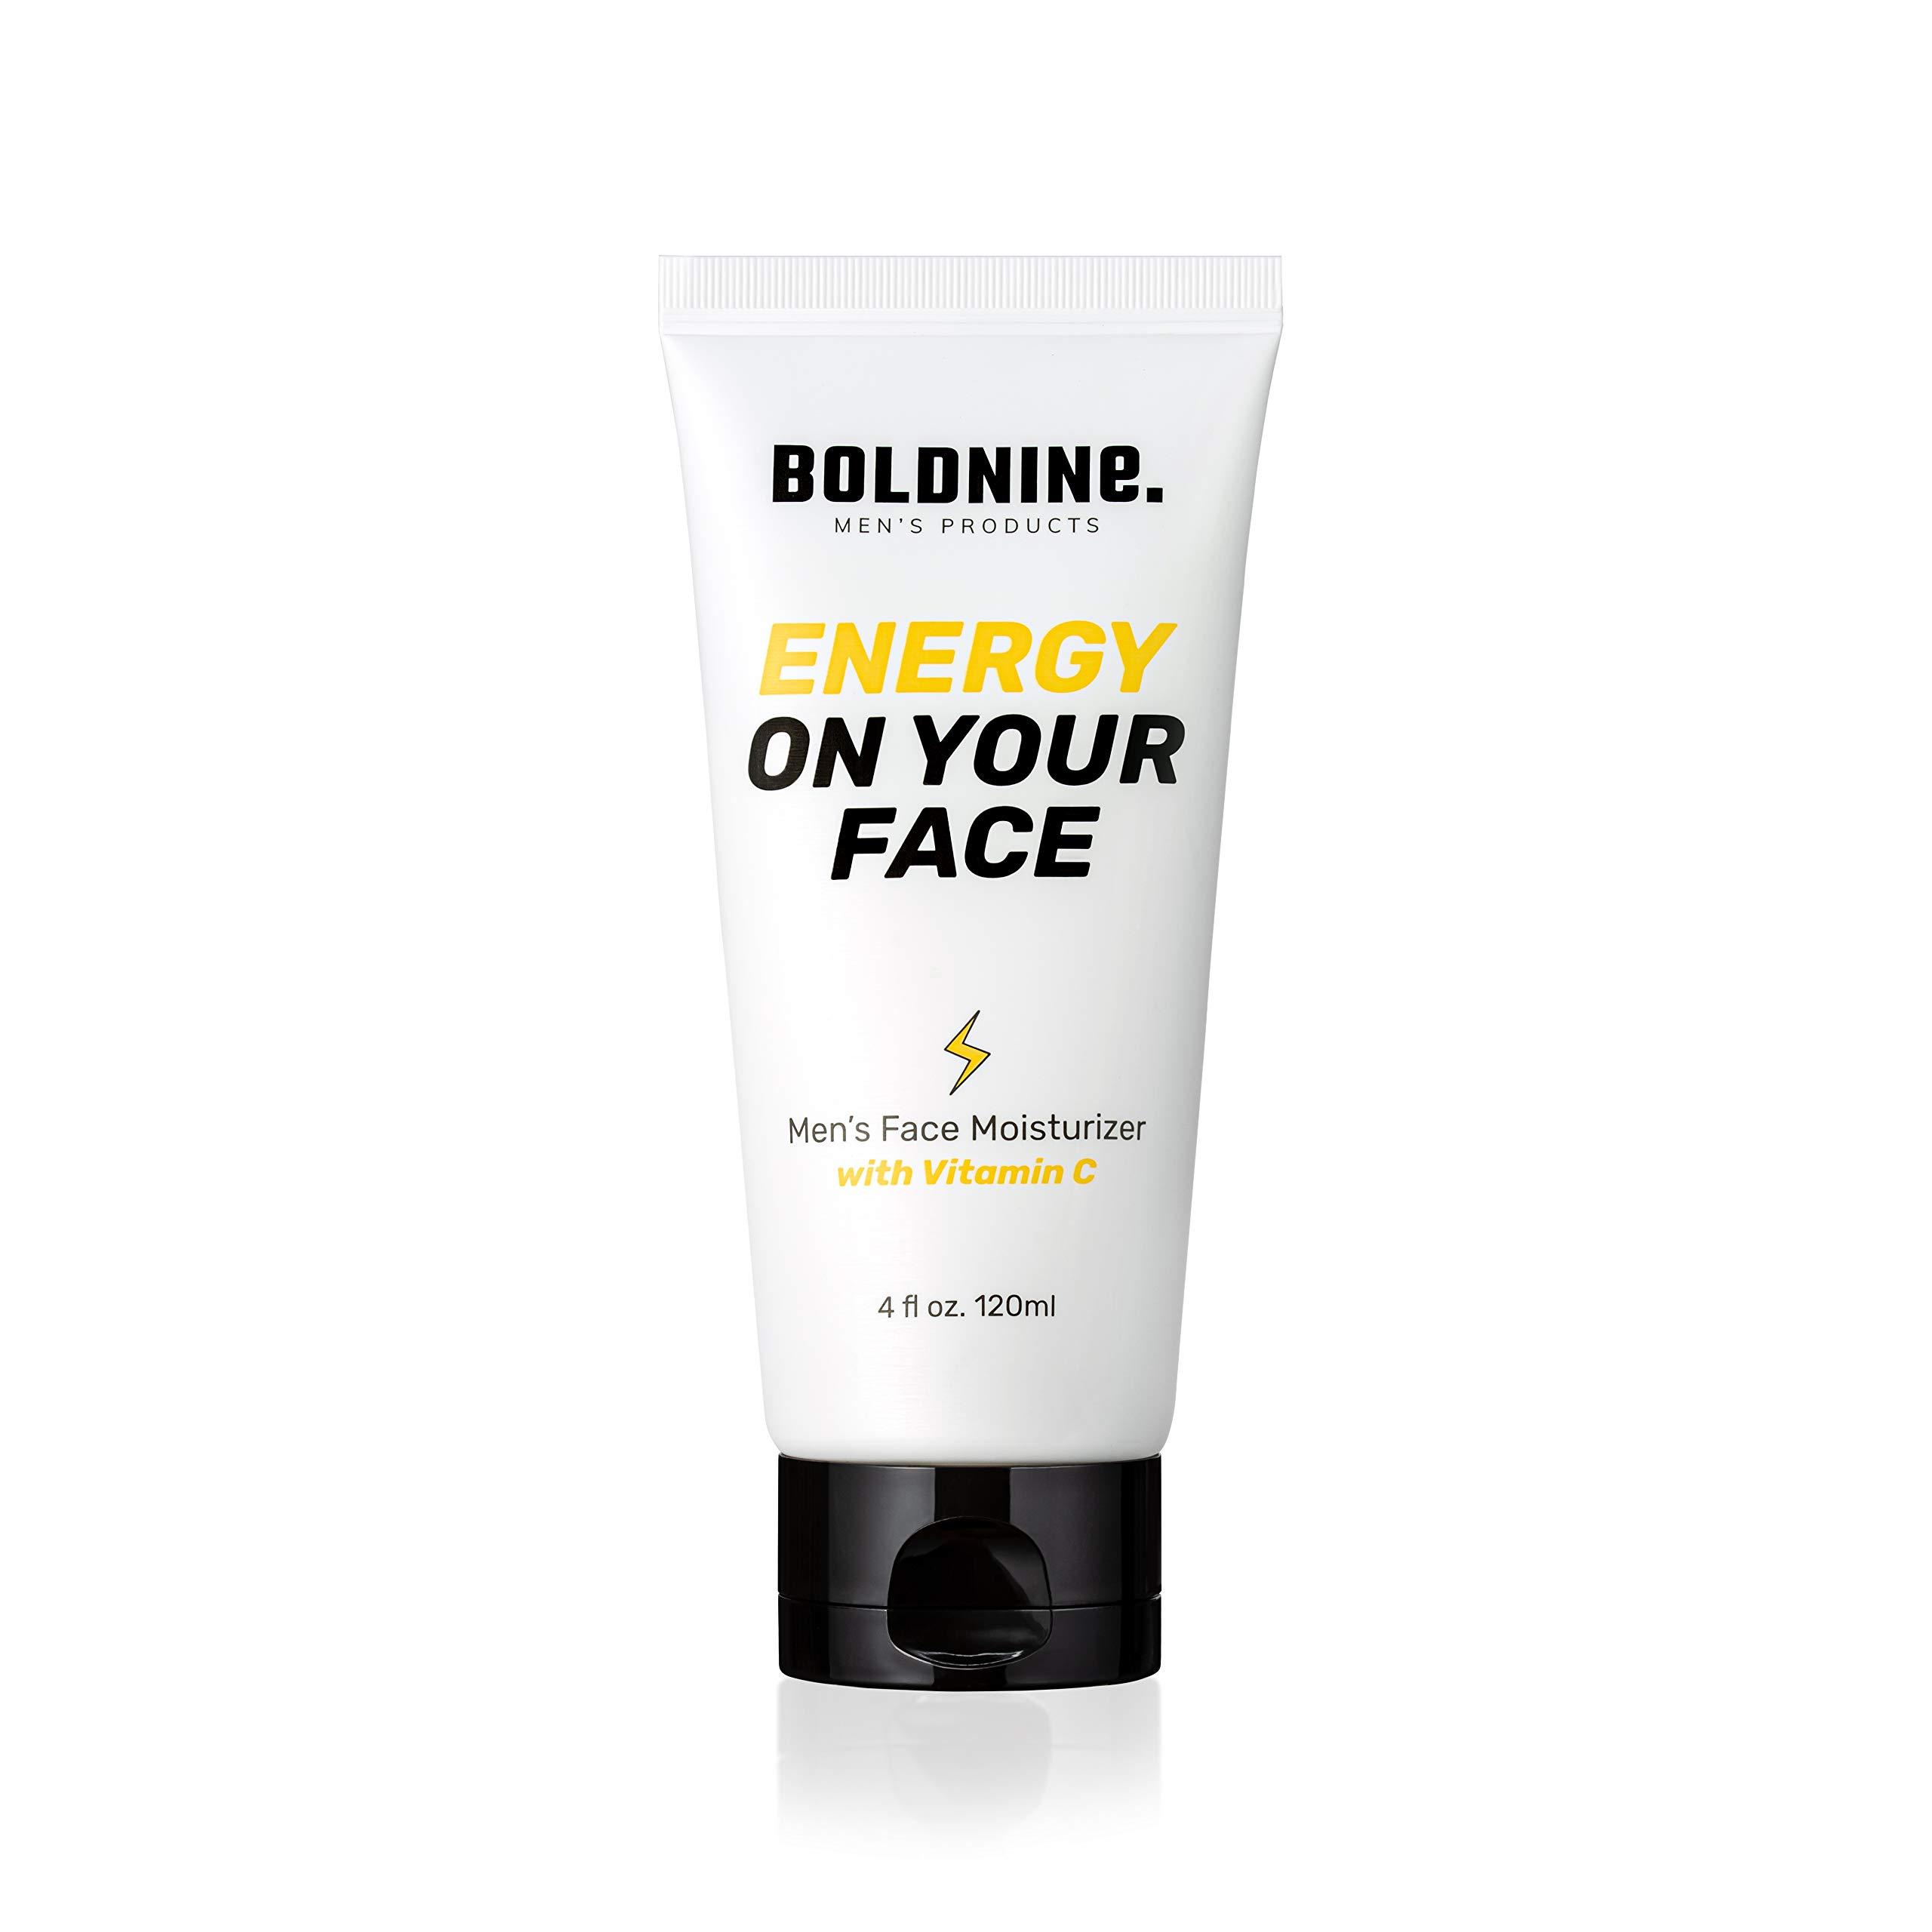 Boldnine Vitamin C Face Moisturizer for Men - 4oz | Anti Aging, Super Hydration | Suitable for Dry & Sensitive Skin, Natural Ingredients